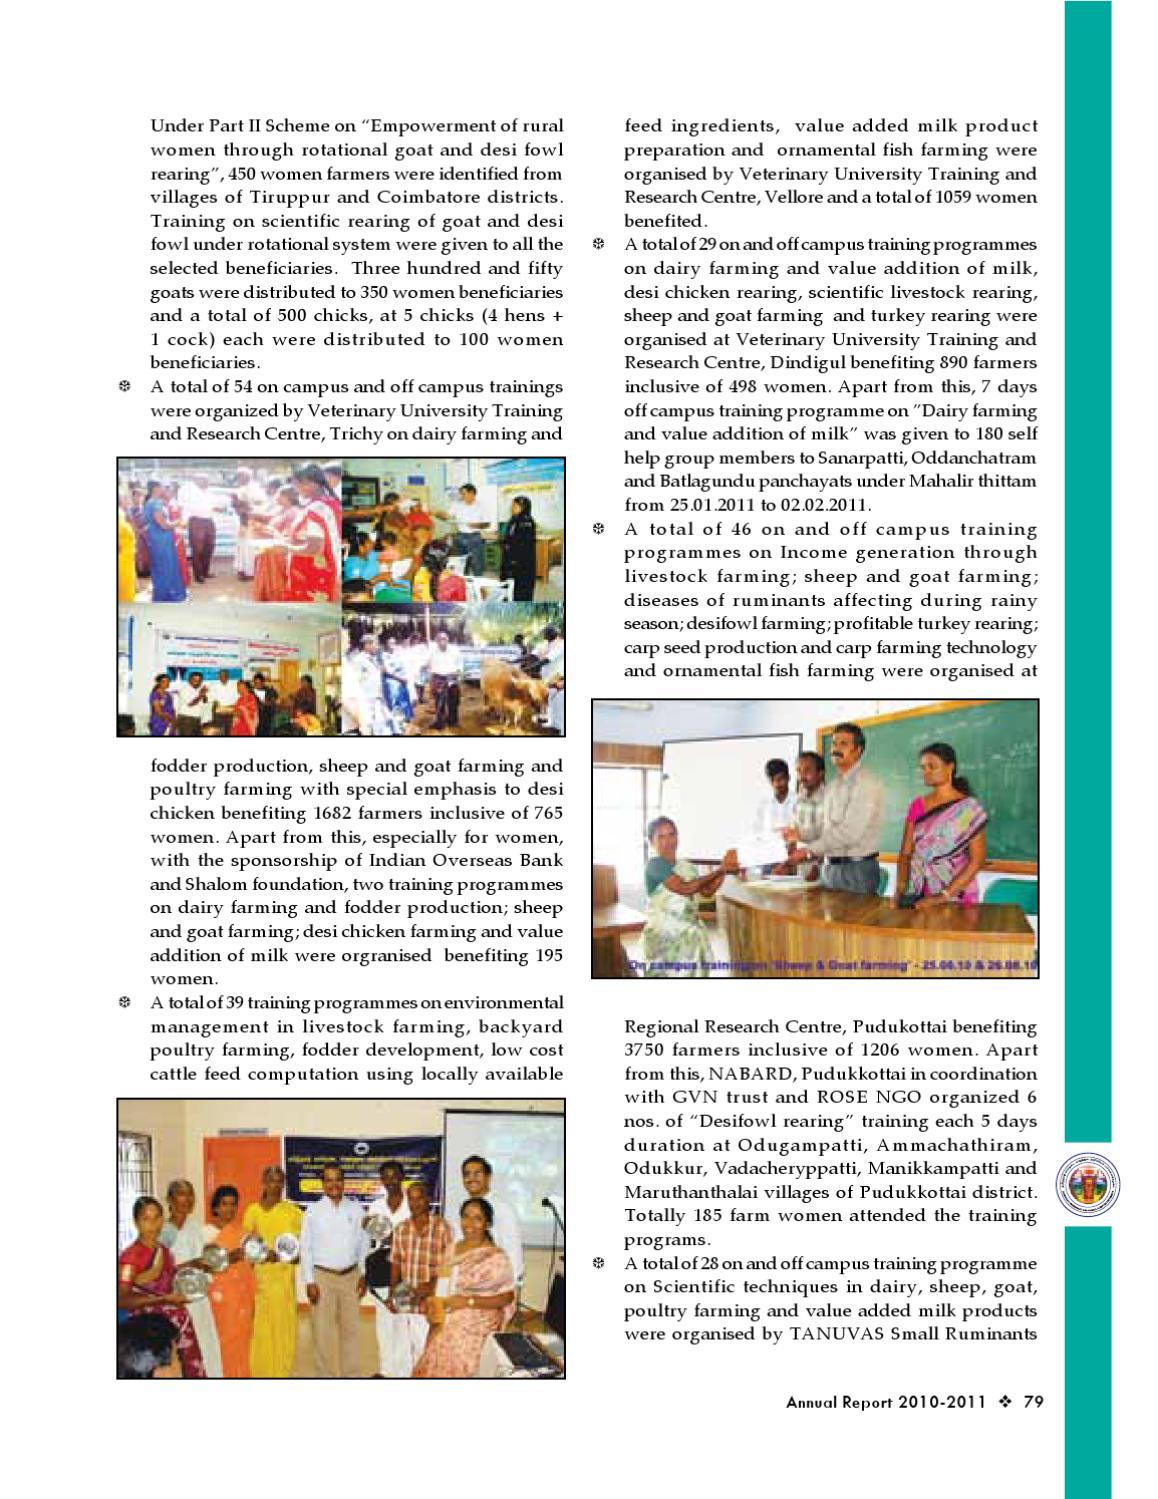 annual report of tanuvas by sureshkumar s issuu